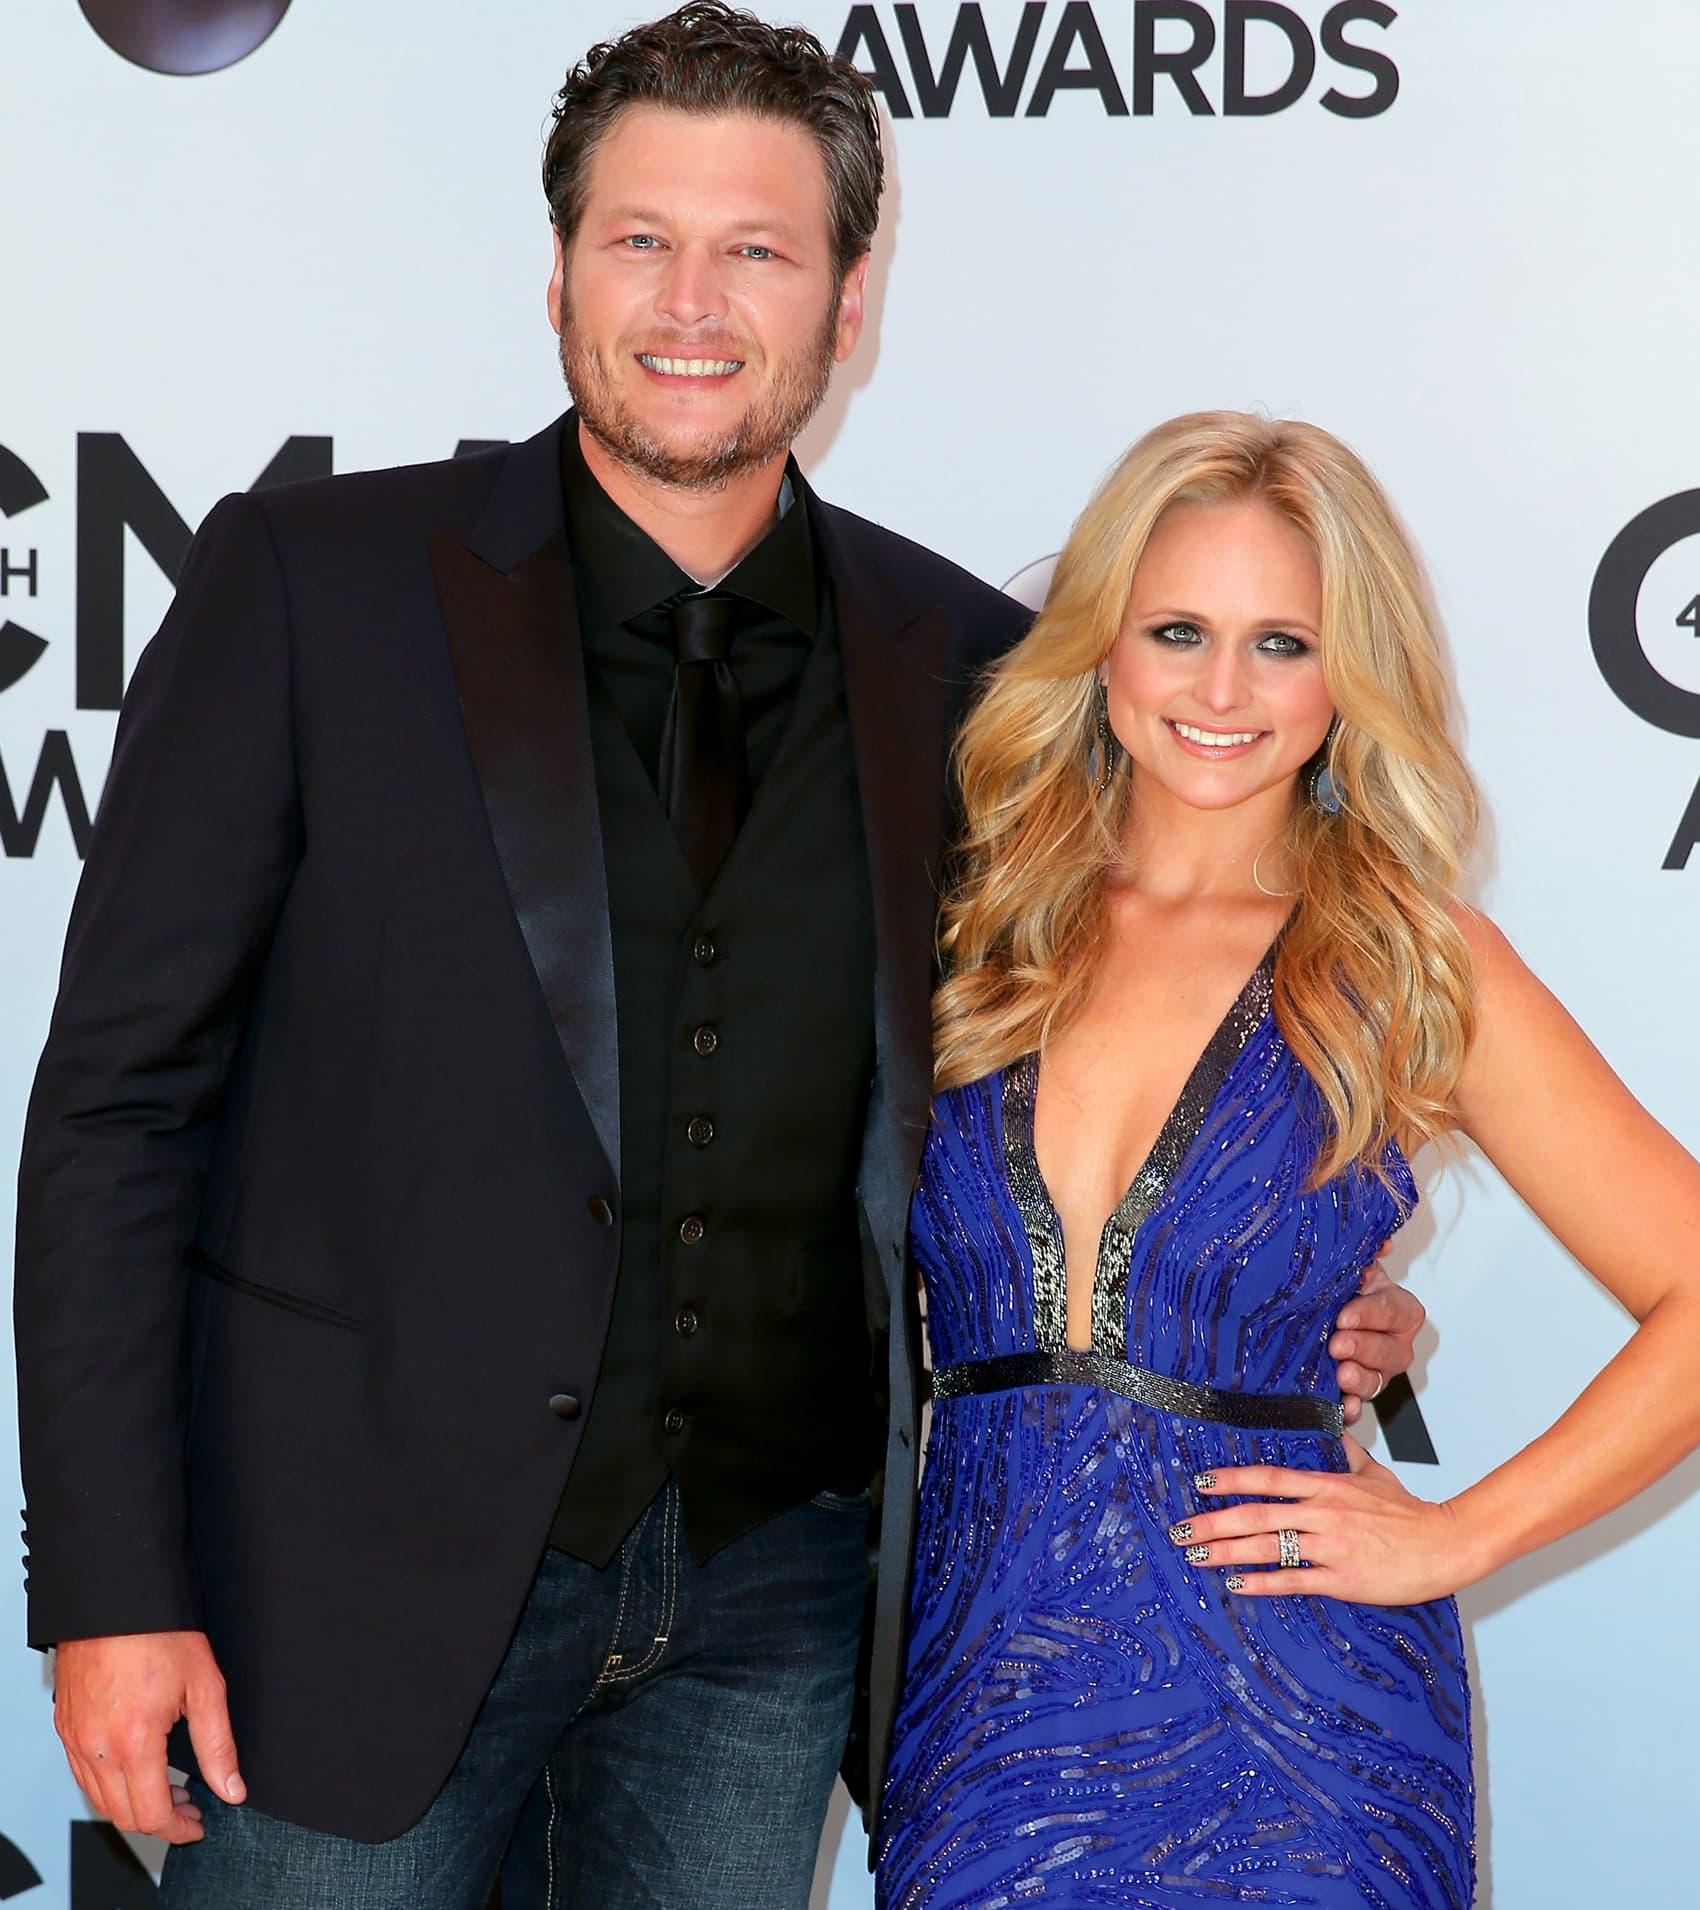 Blake Shelton and Miranda Lambert attend the 47th annual CMA Awards